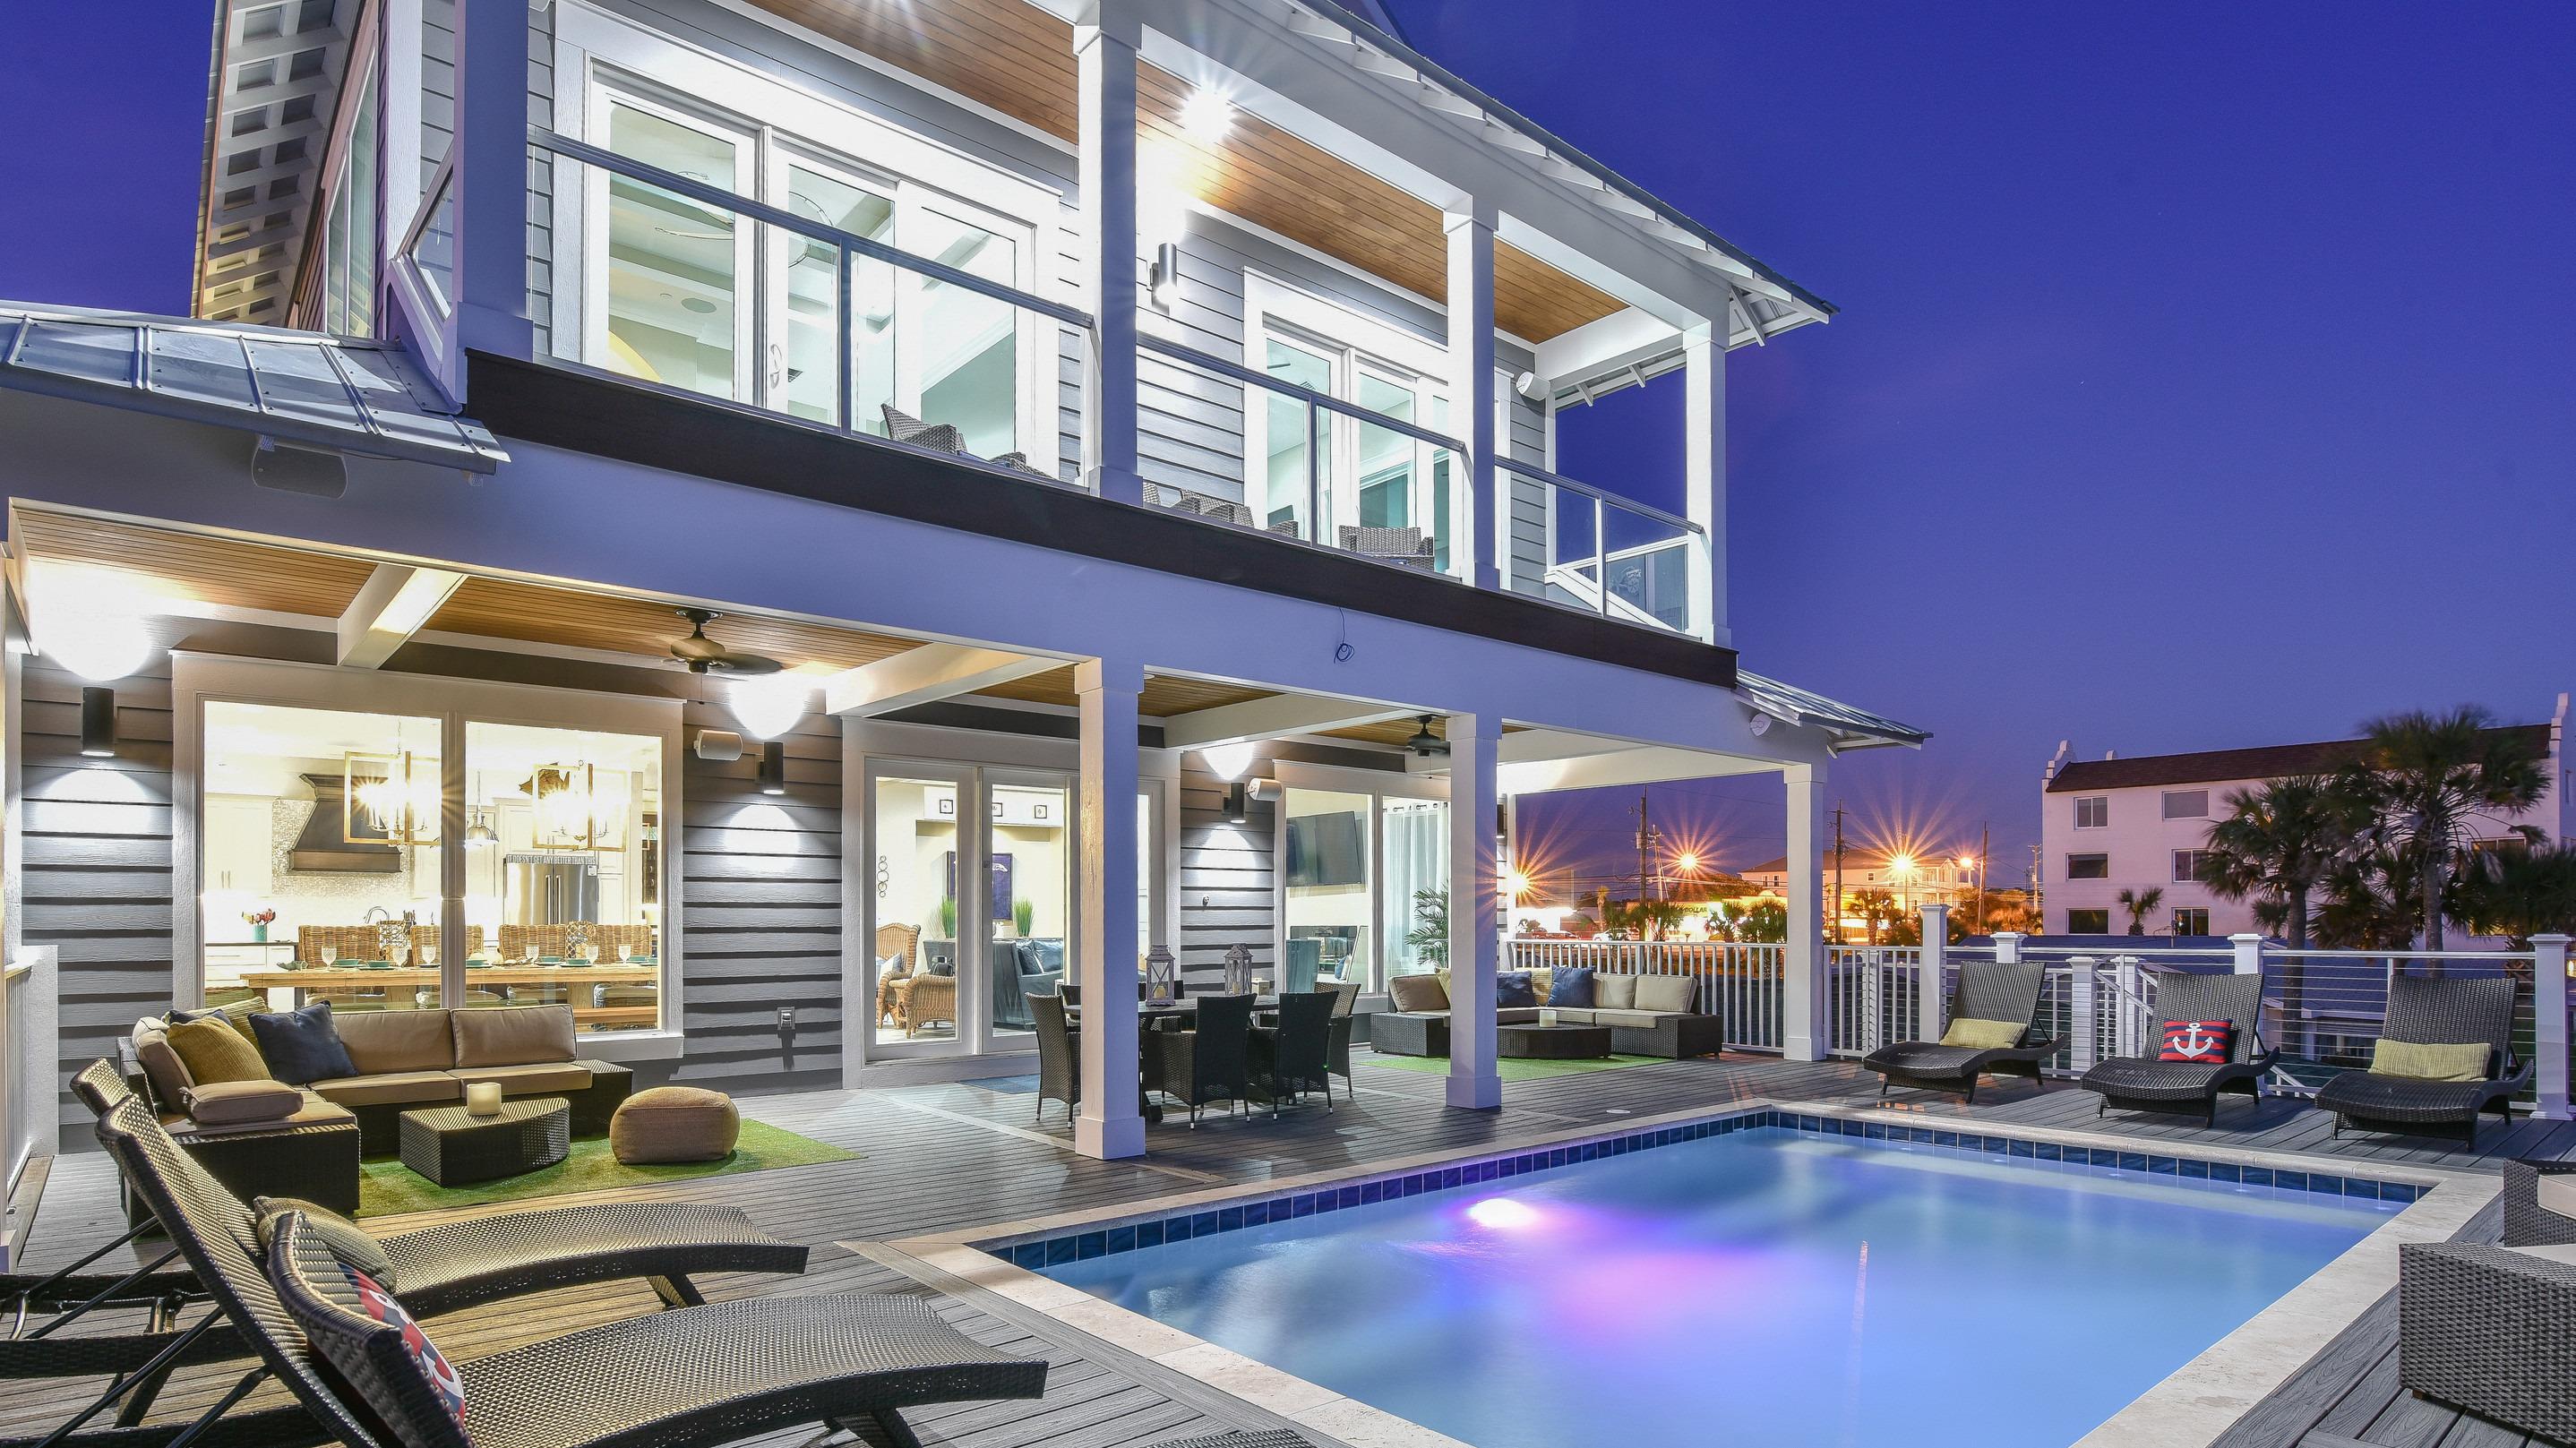 Florida Us Vacation Rentals House Rentals More Vrbo